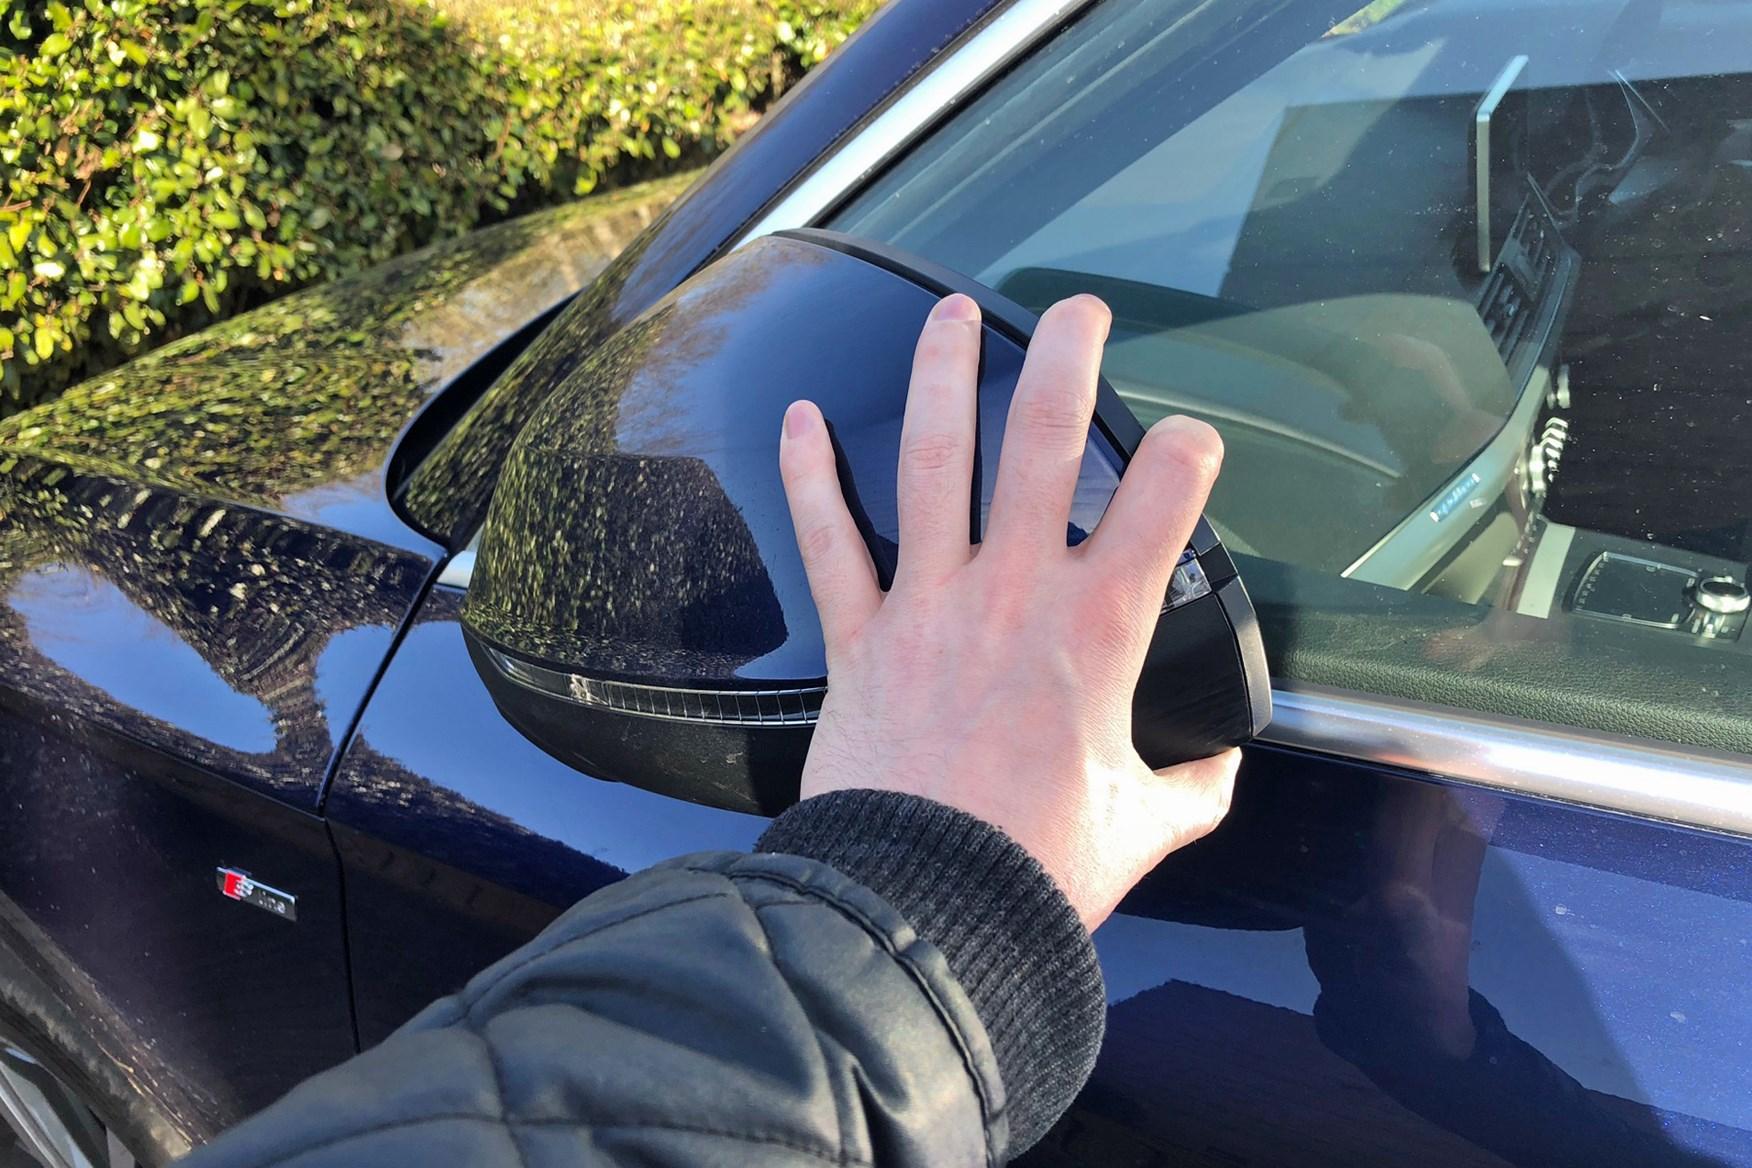 Audi Q5 long-term review: Farewell | Parkers